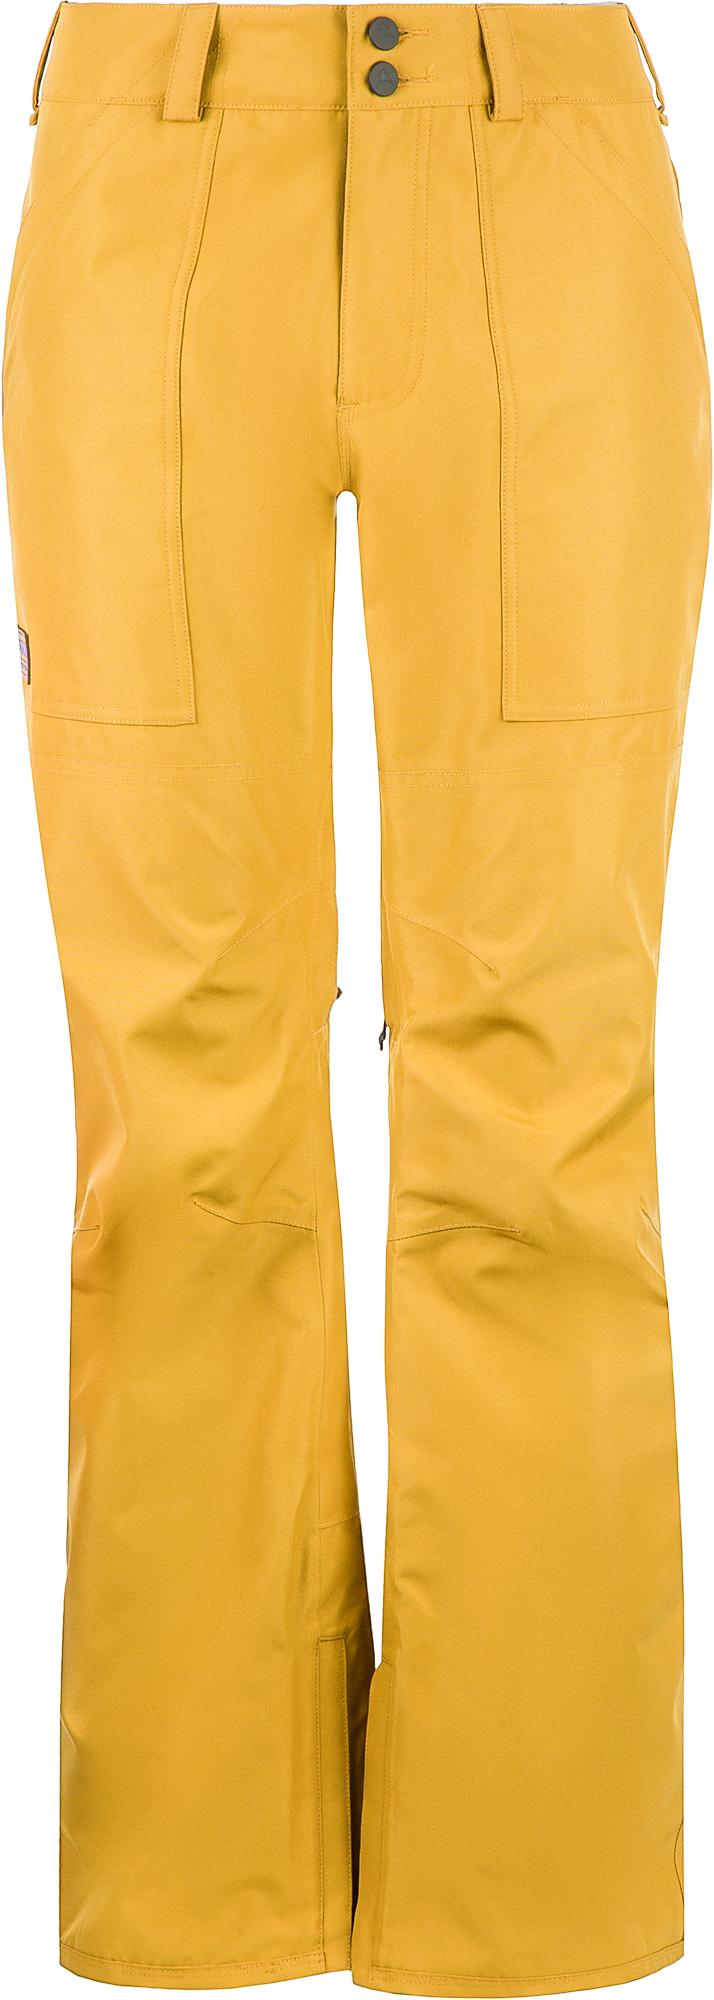 Burton Брюки мужские Burton Gore Ballast, размер 46-48 цена 2017